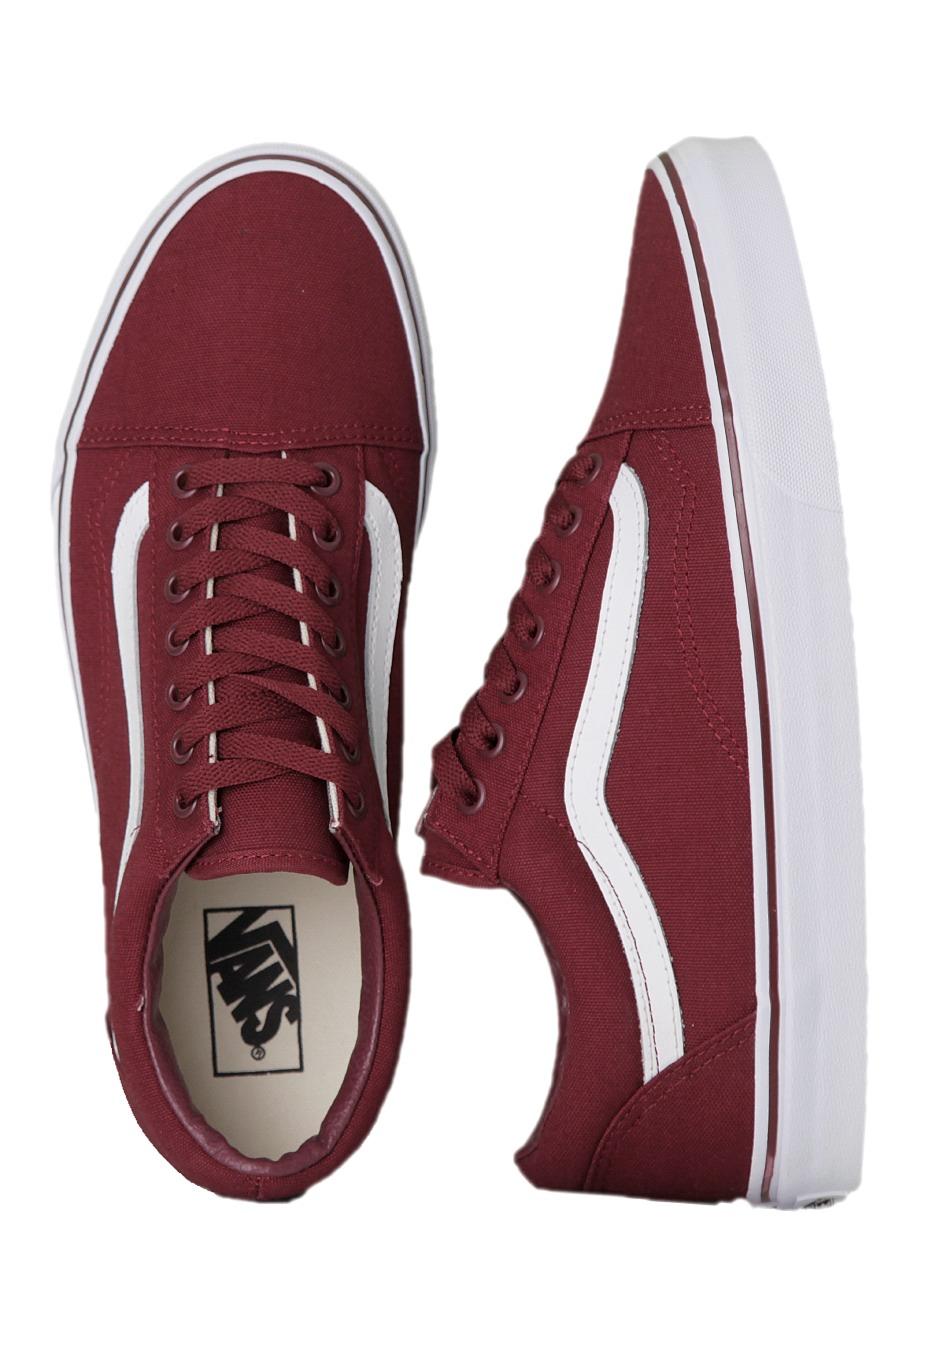 Red Vans Shoes Uk